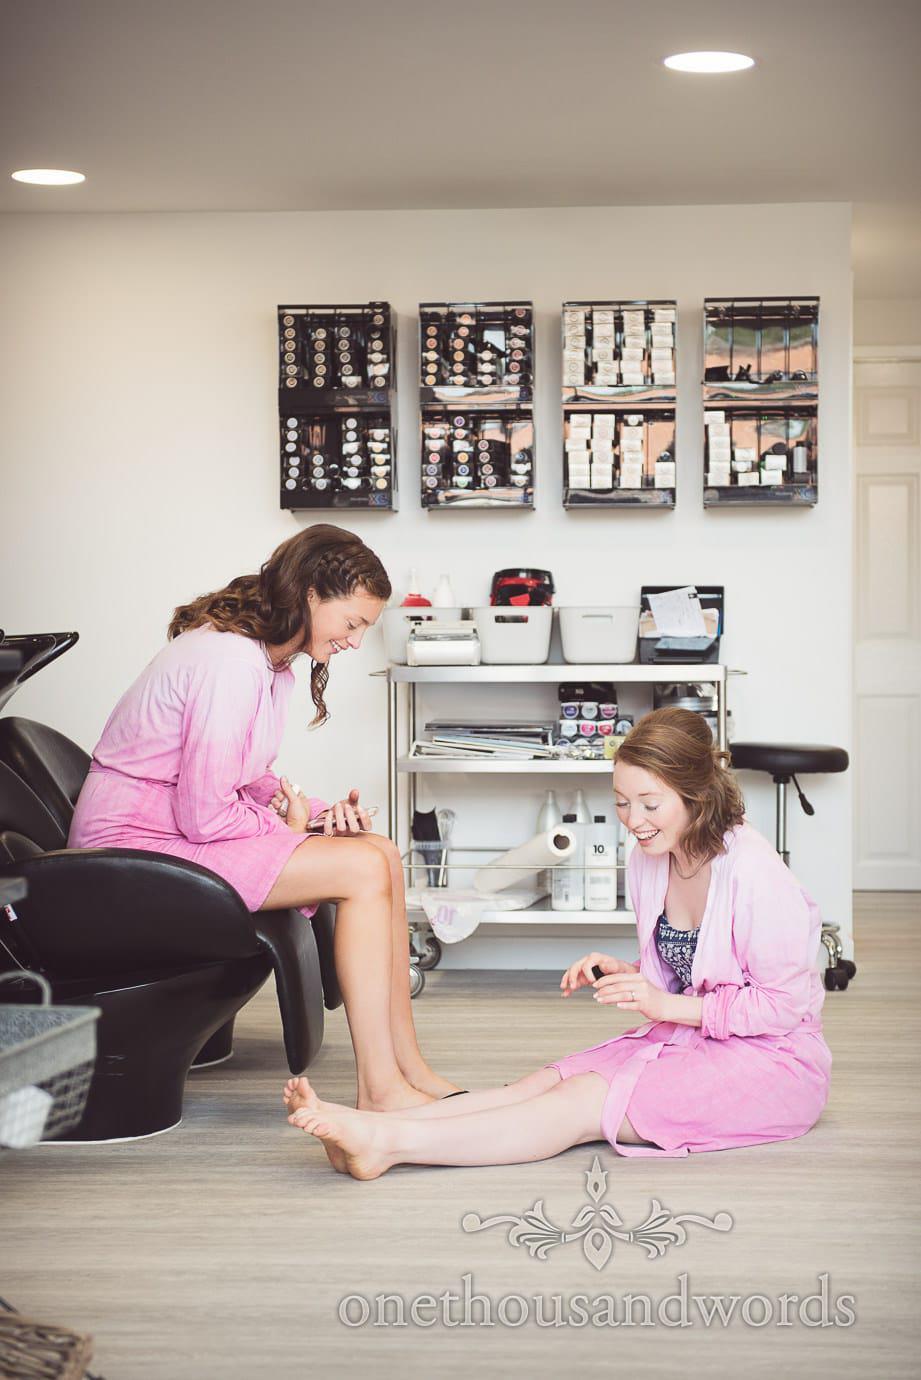 Bridesmaids paint their toenails at beauty salon during wedding morning preparations